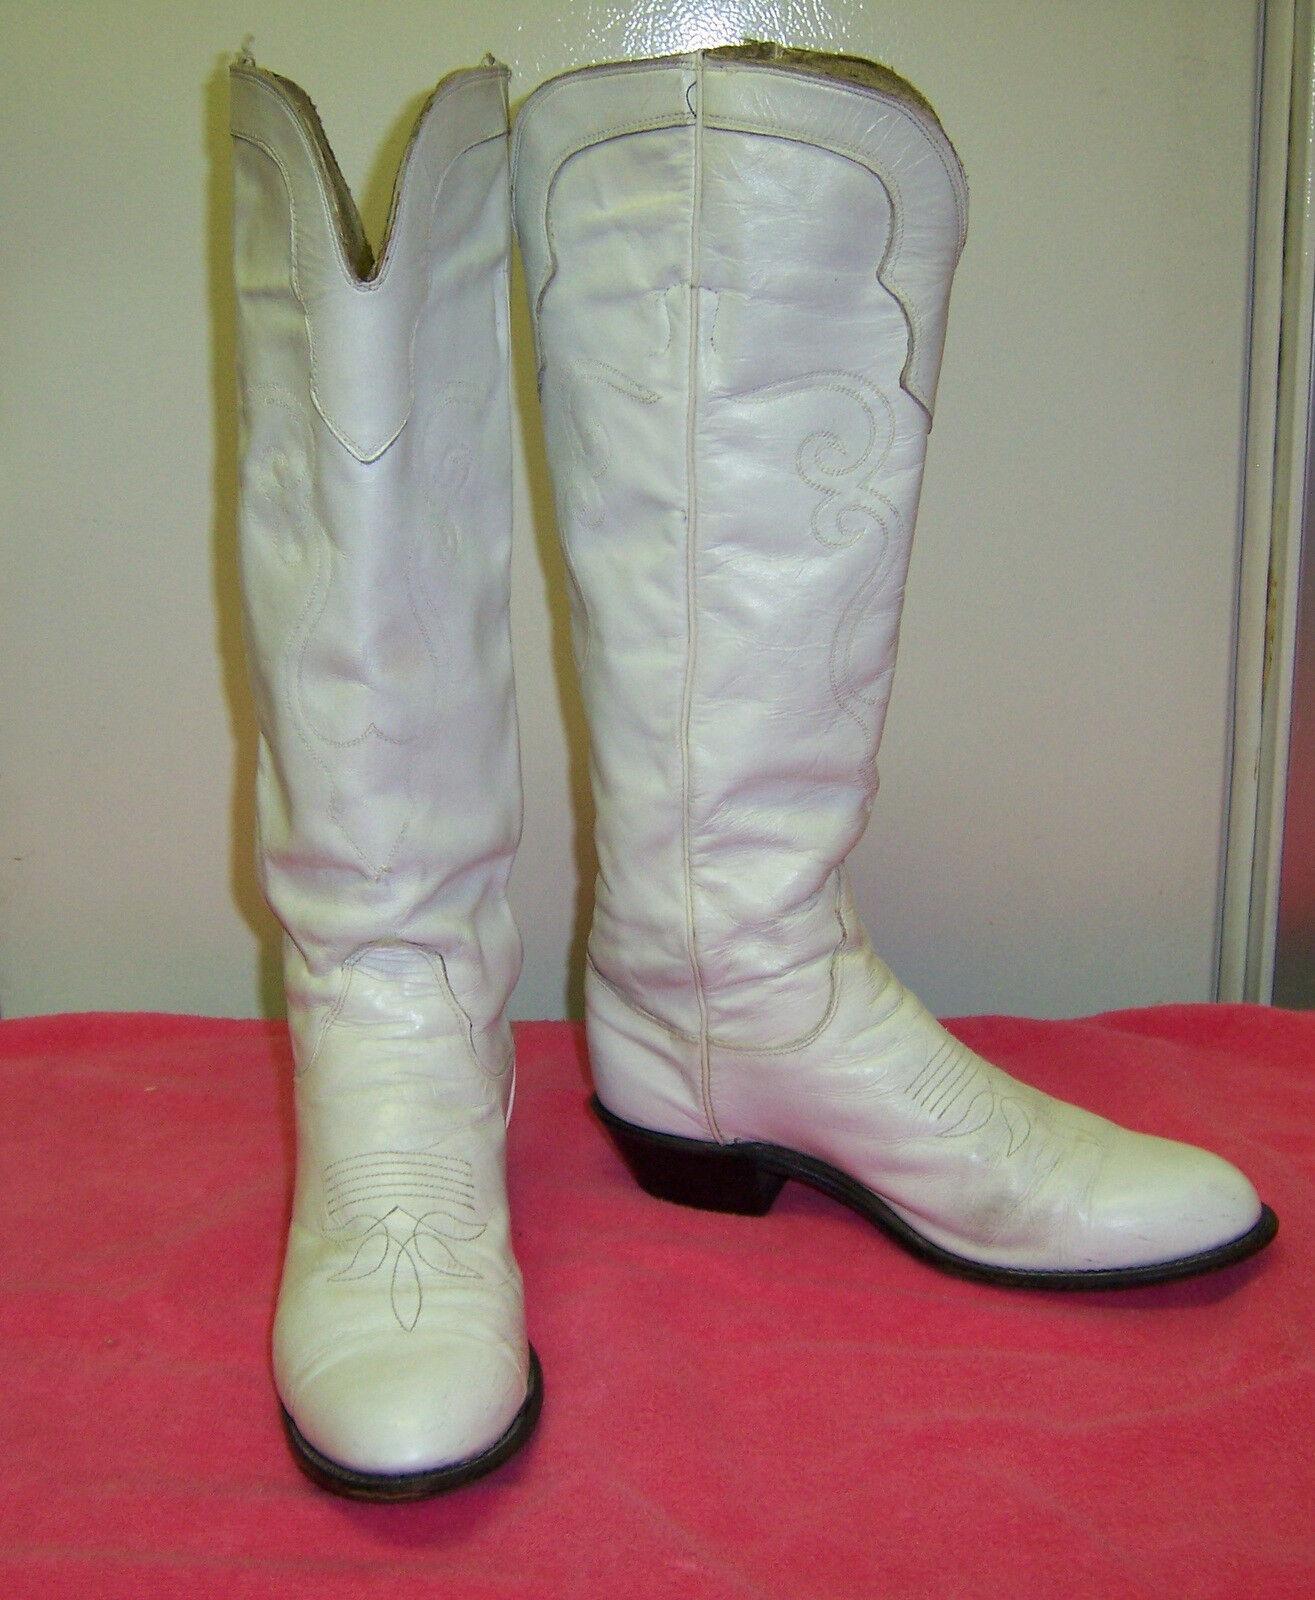 Evenin' Star Custom Made Dance Boots, White, Size 6 1/2 C, 15 in tall shaft